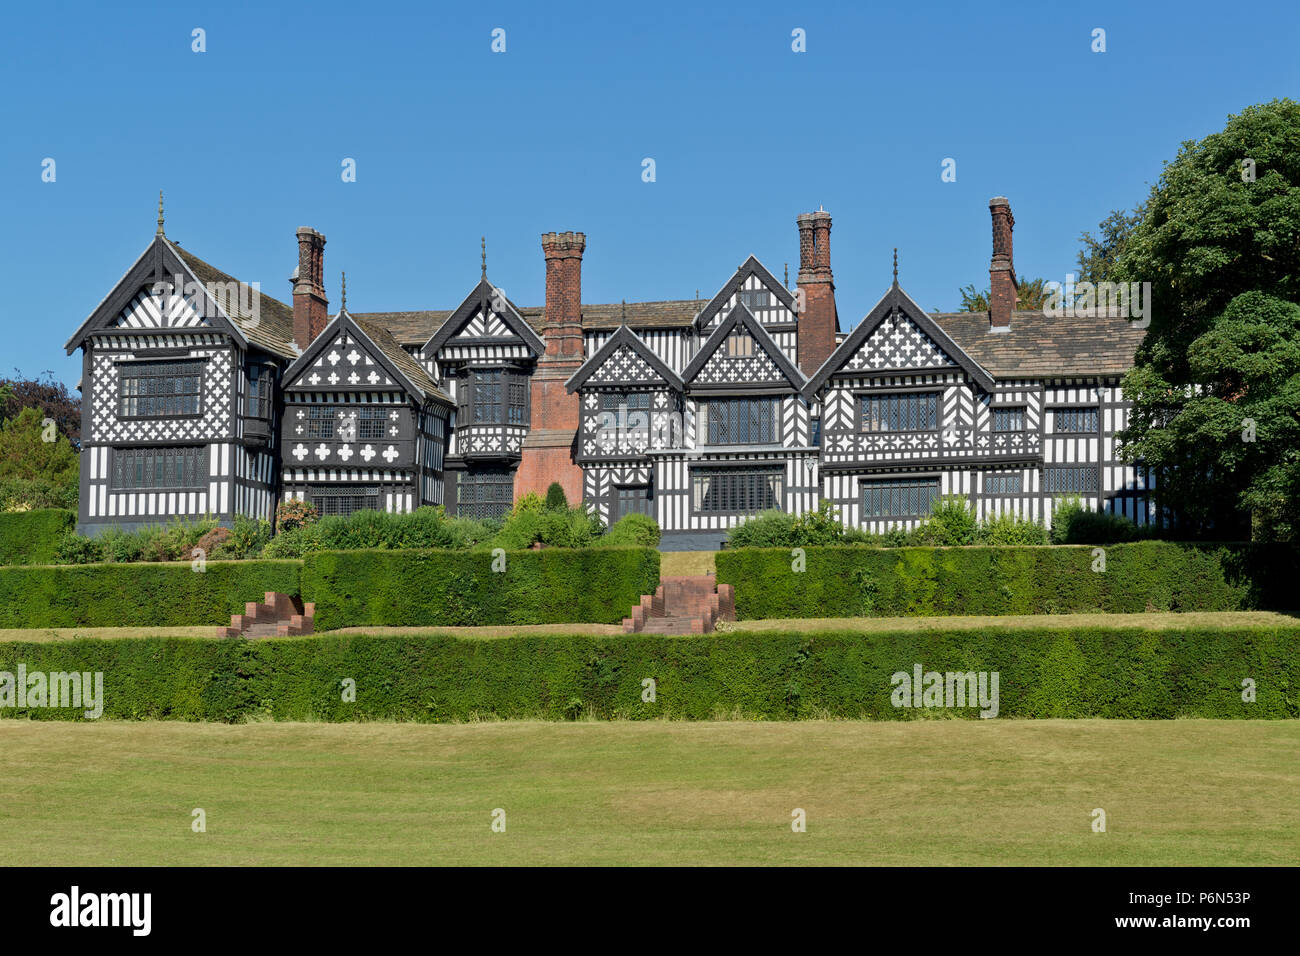 Bramall Hall located in Bramhall Park, Stockport, Cheshire. - Stock Image